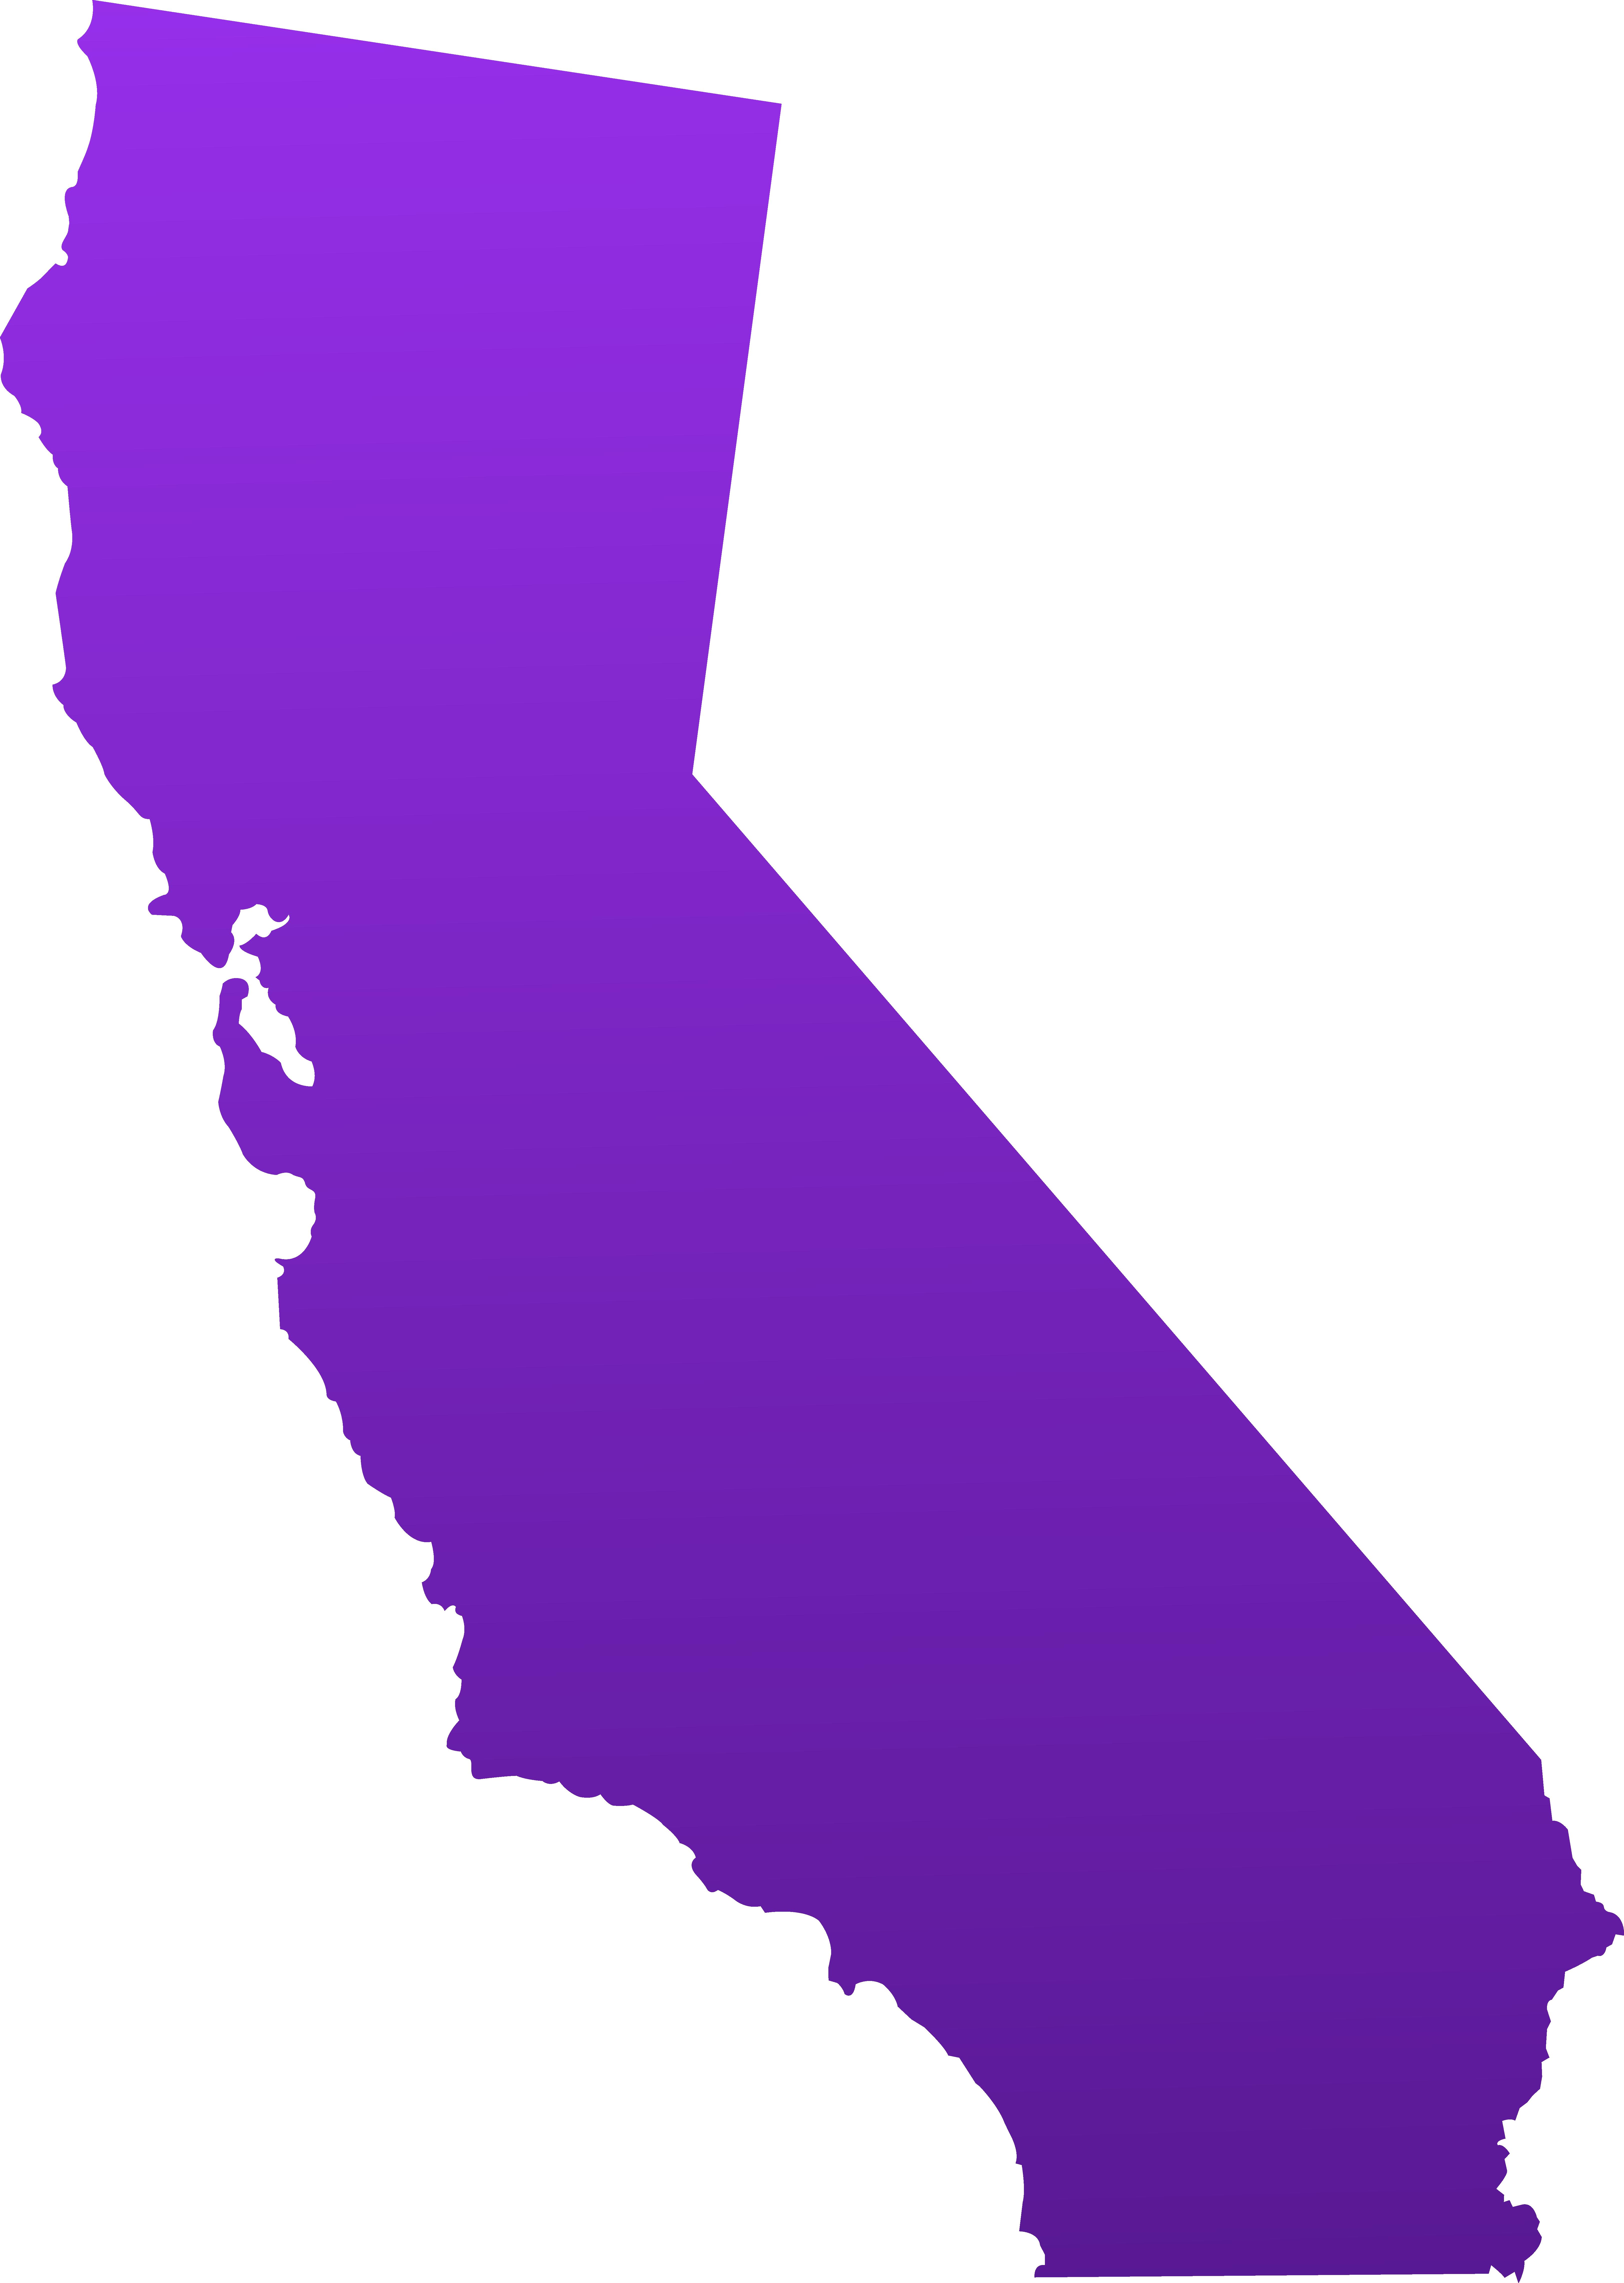 California State Design - Free Clip Art